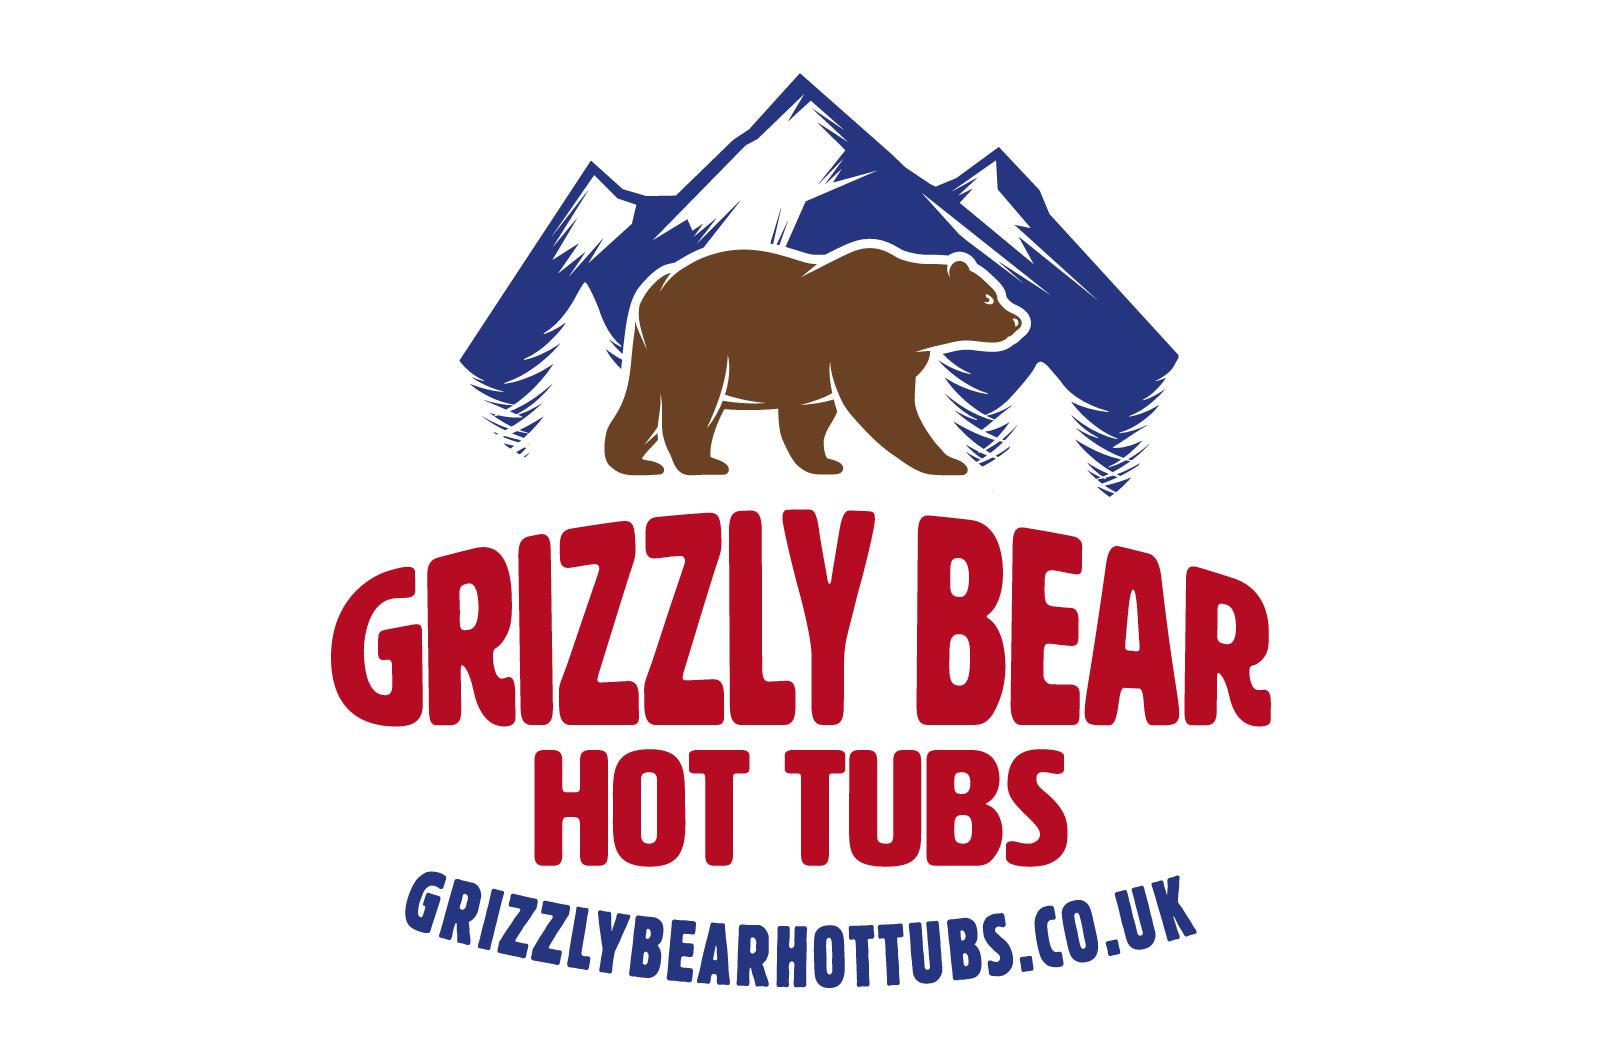 Grizzly Bear Hot Tub Company